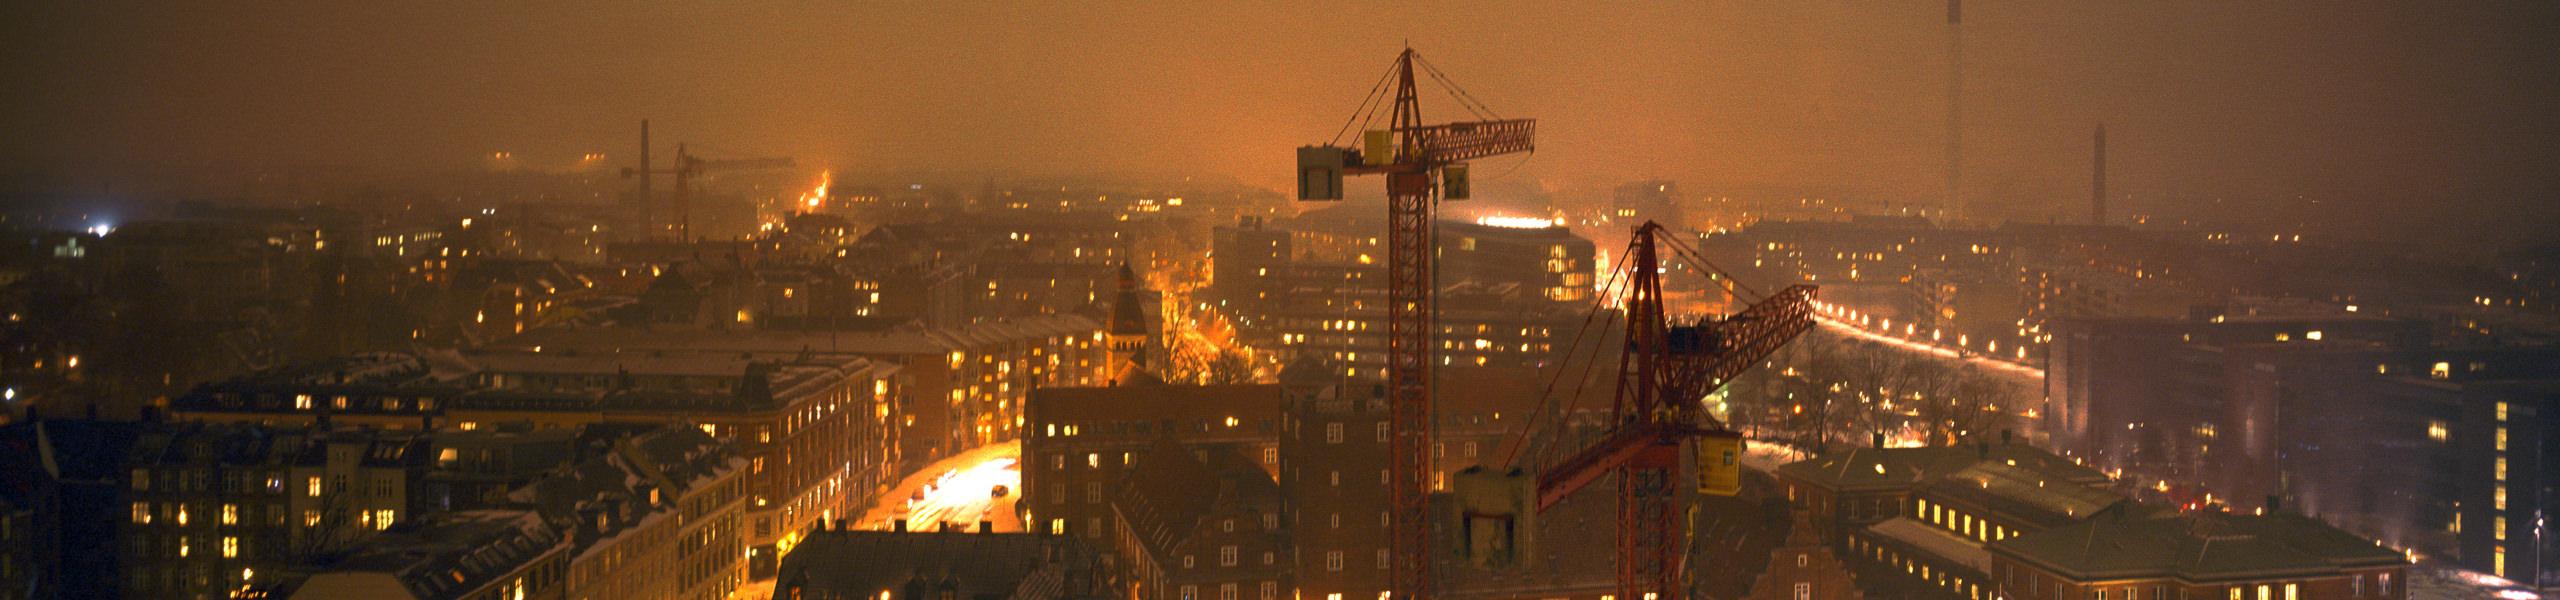 20060101_Urban_Landscape_Denmark_MGP_534.jpg